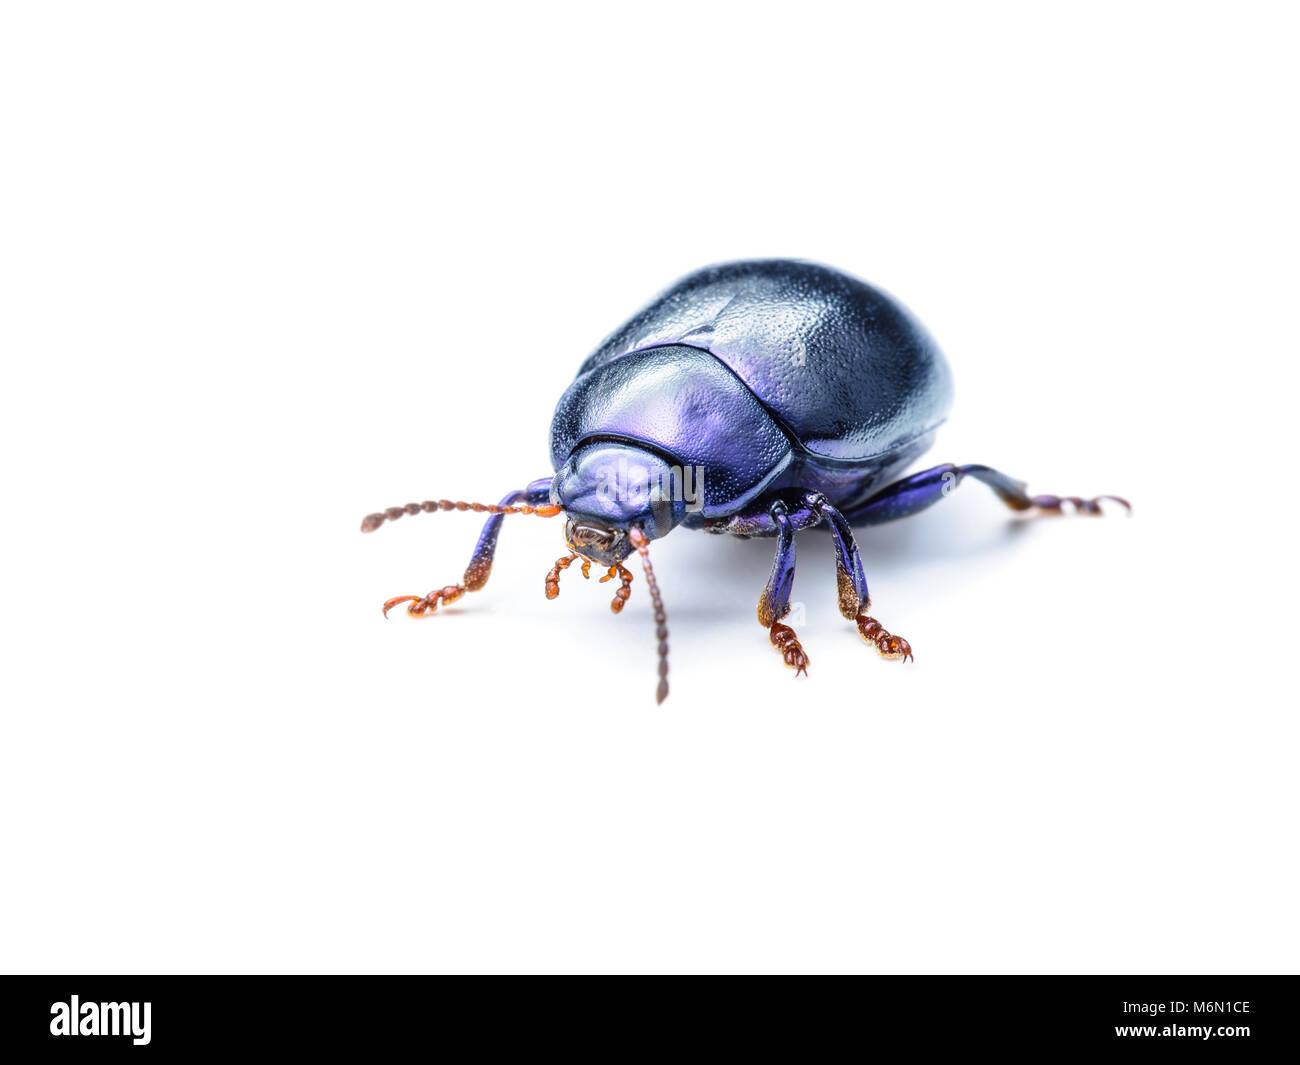 Chrysolina Coerulans Blue Mint Leaf Beetle Insect Macro Isolated on White - Stock Image